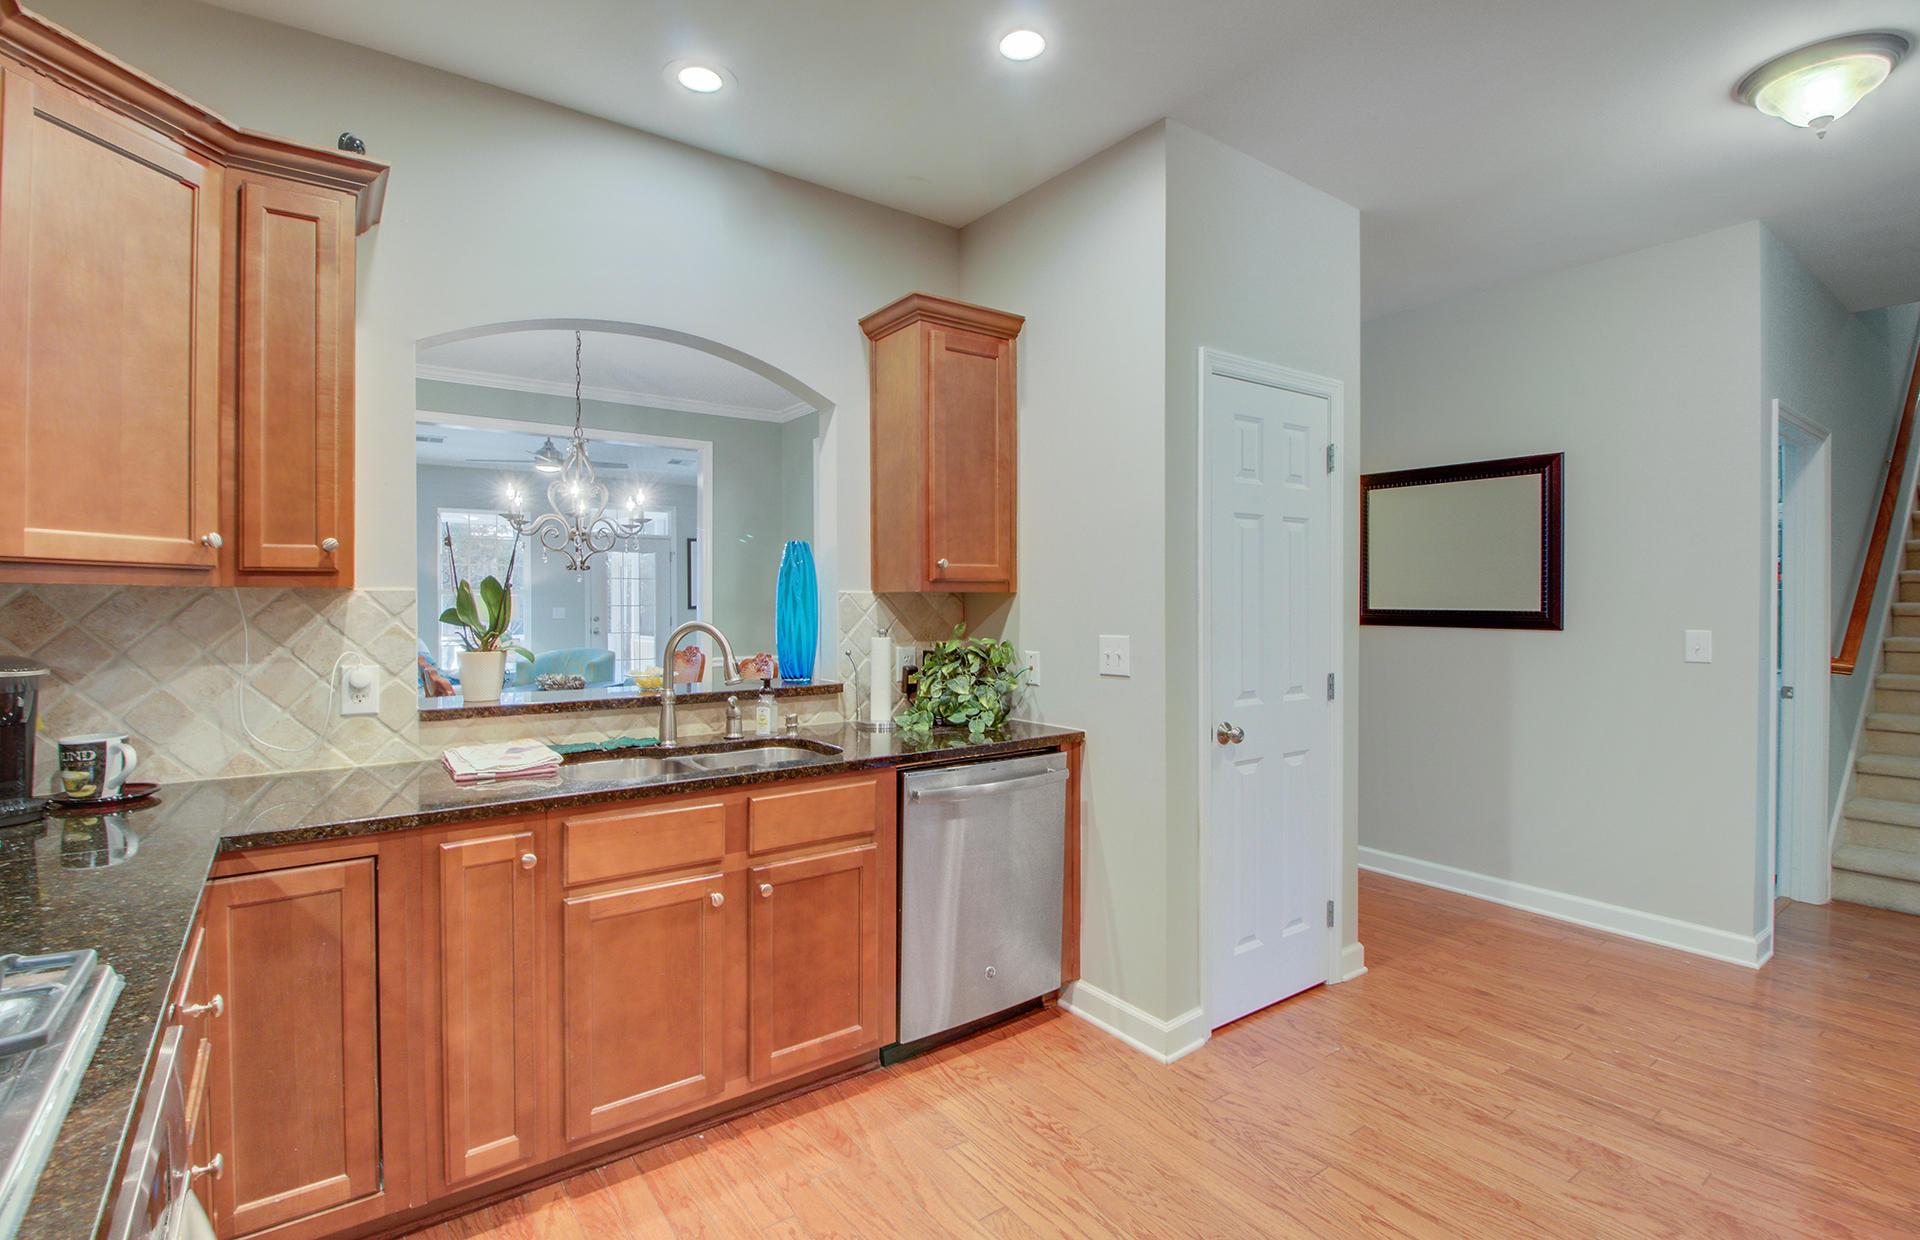 Dunes West Homes For Sale - 145 Fresh Meadow, Mount Pleasant, SC - 12